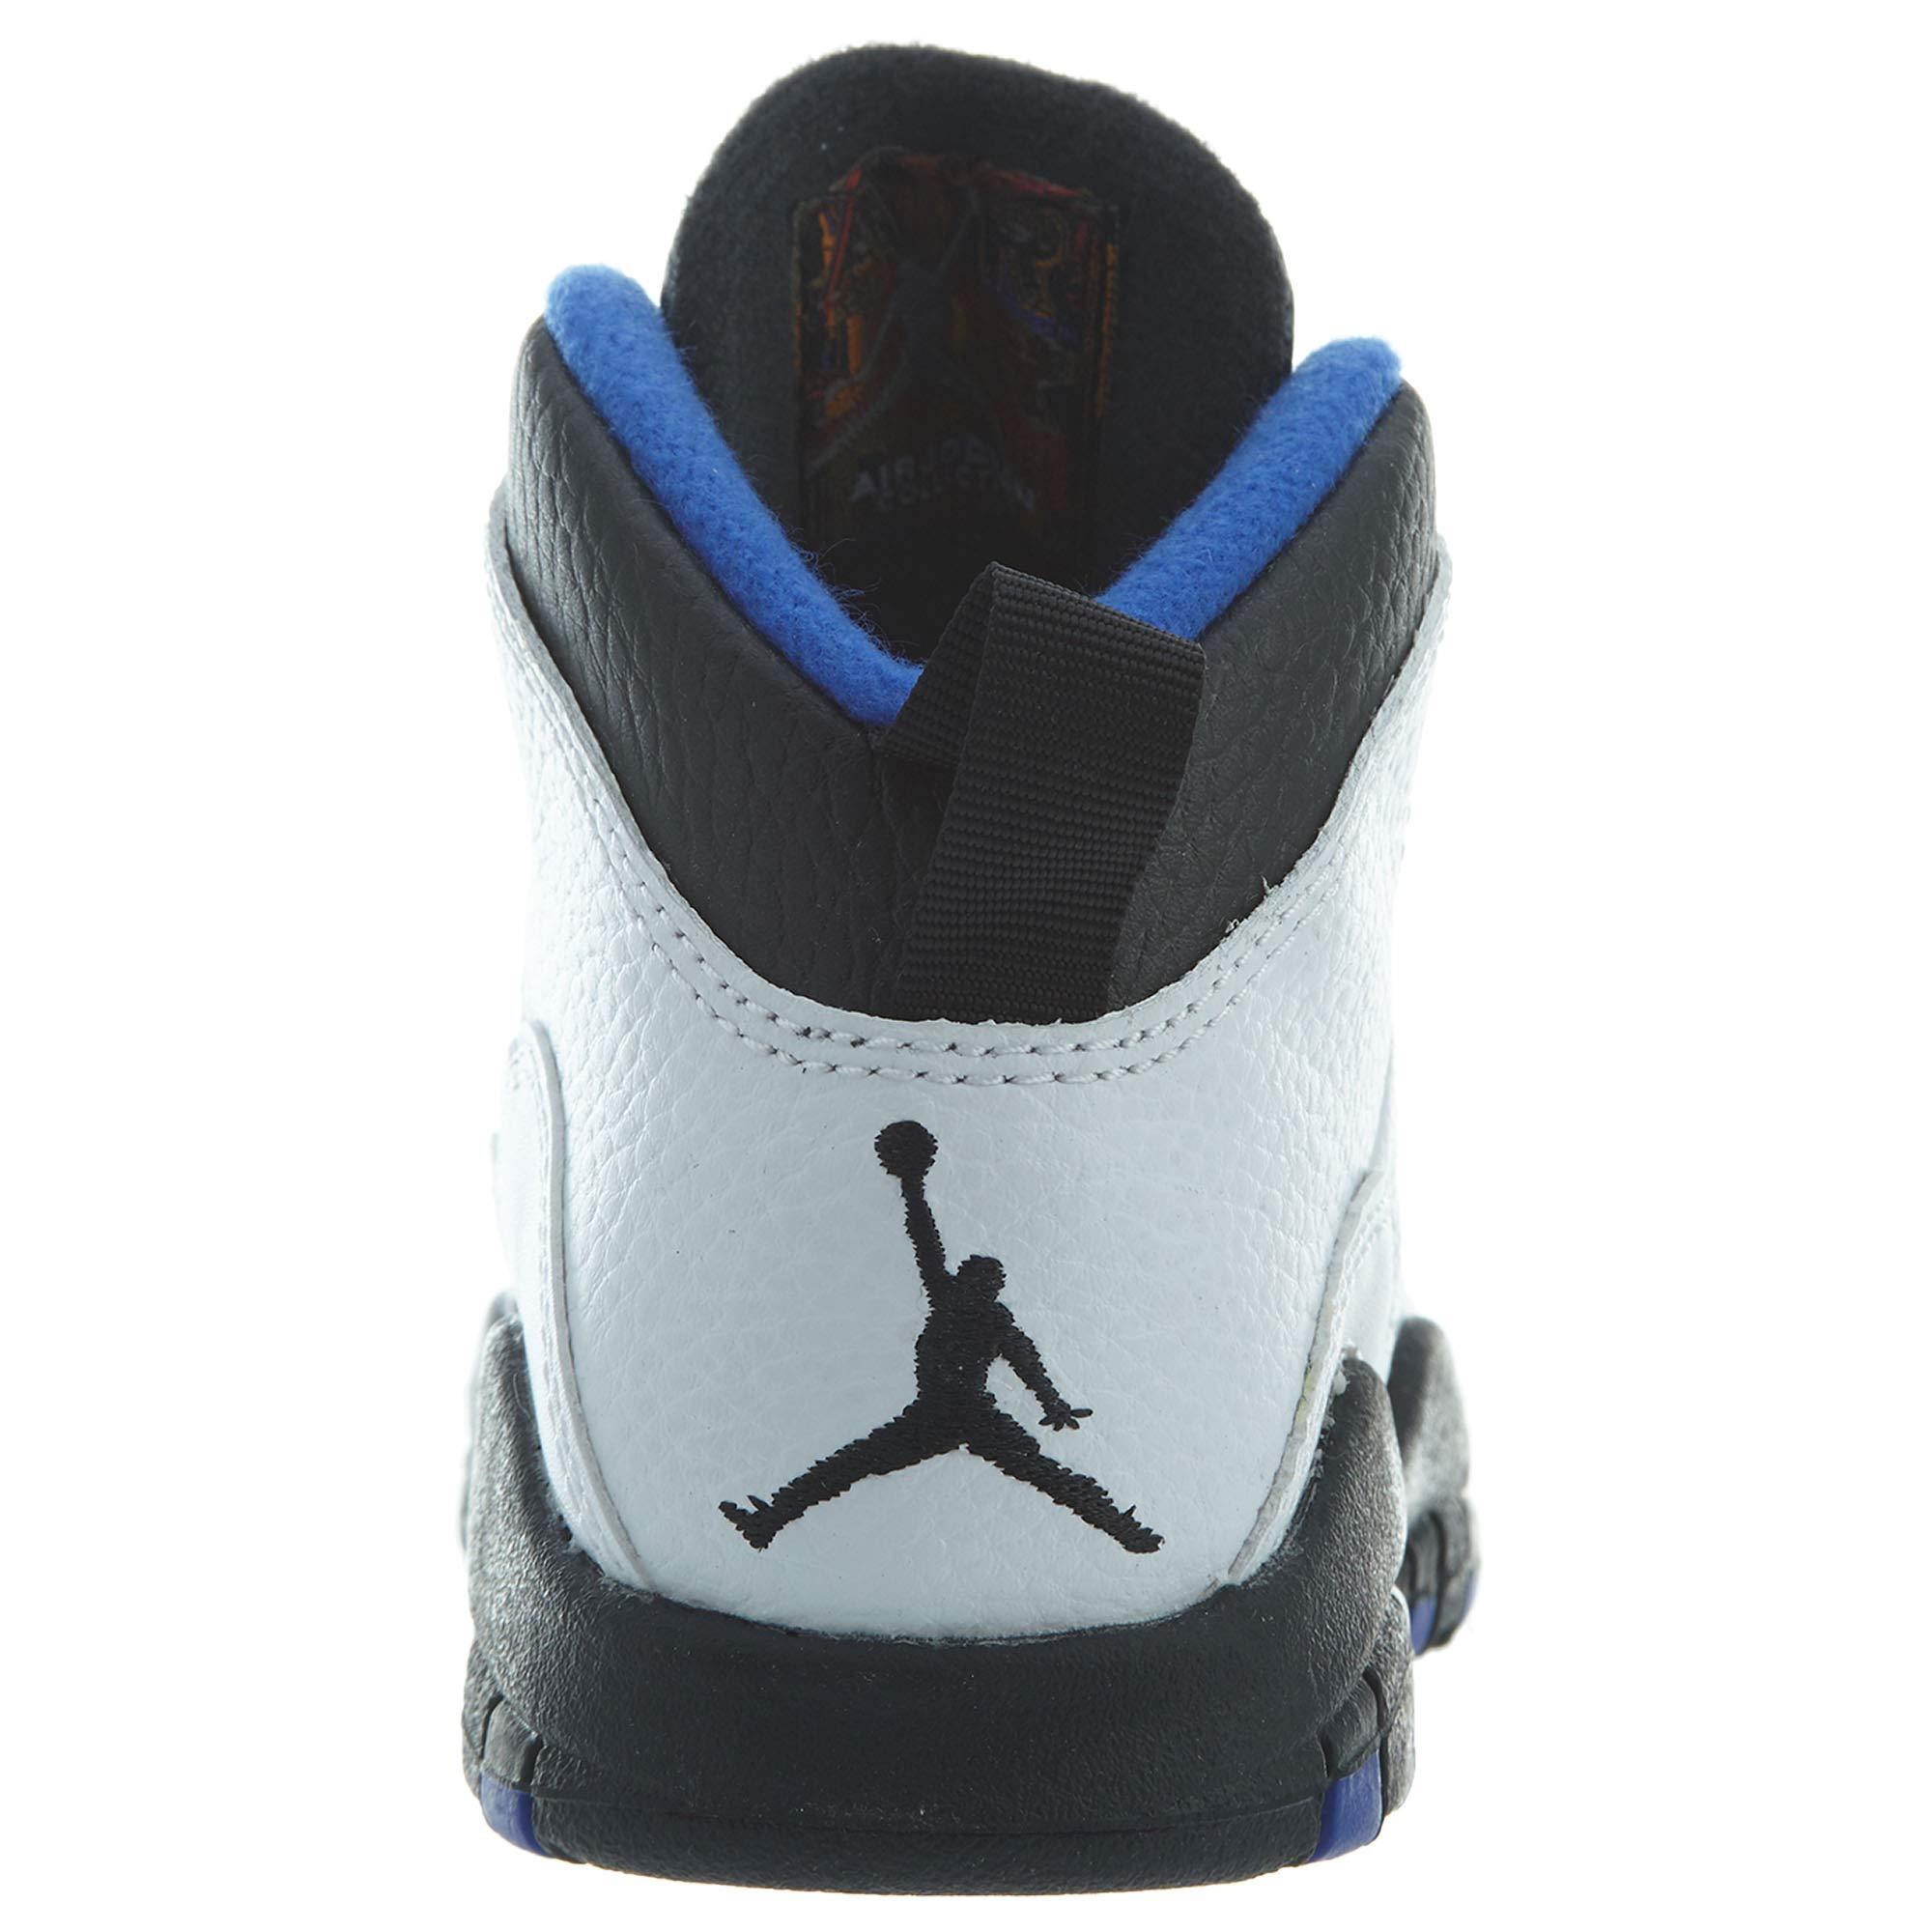 Jordan Air Retro 10''Orlando White/Black-Royal Blue (PS) (13 M US Little Kid) by Jordan (Image #4)